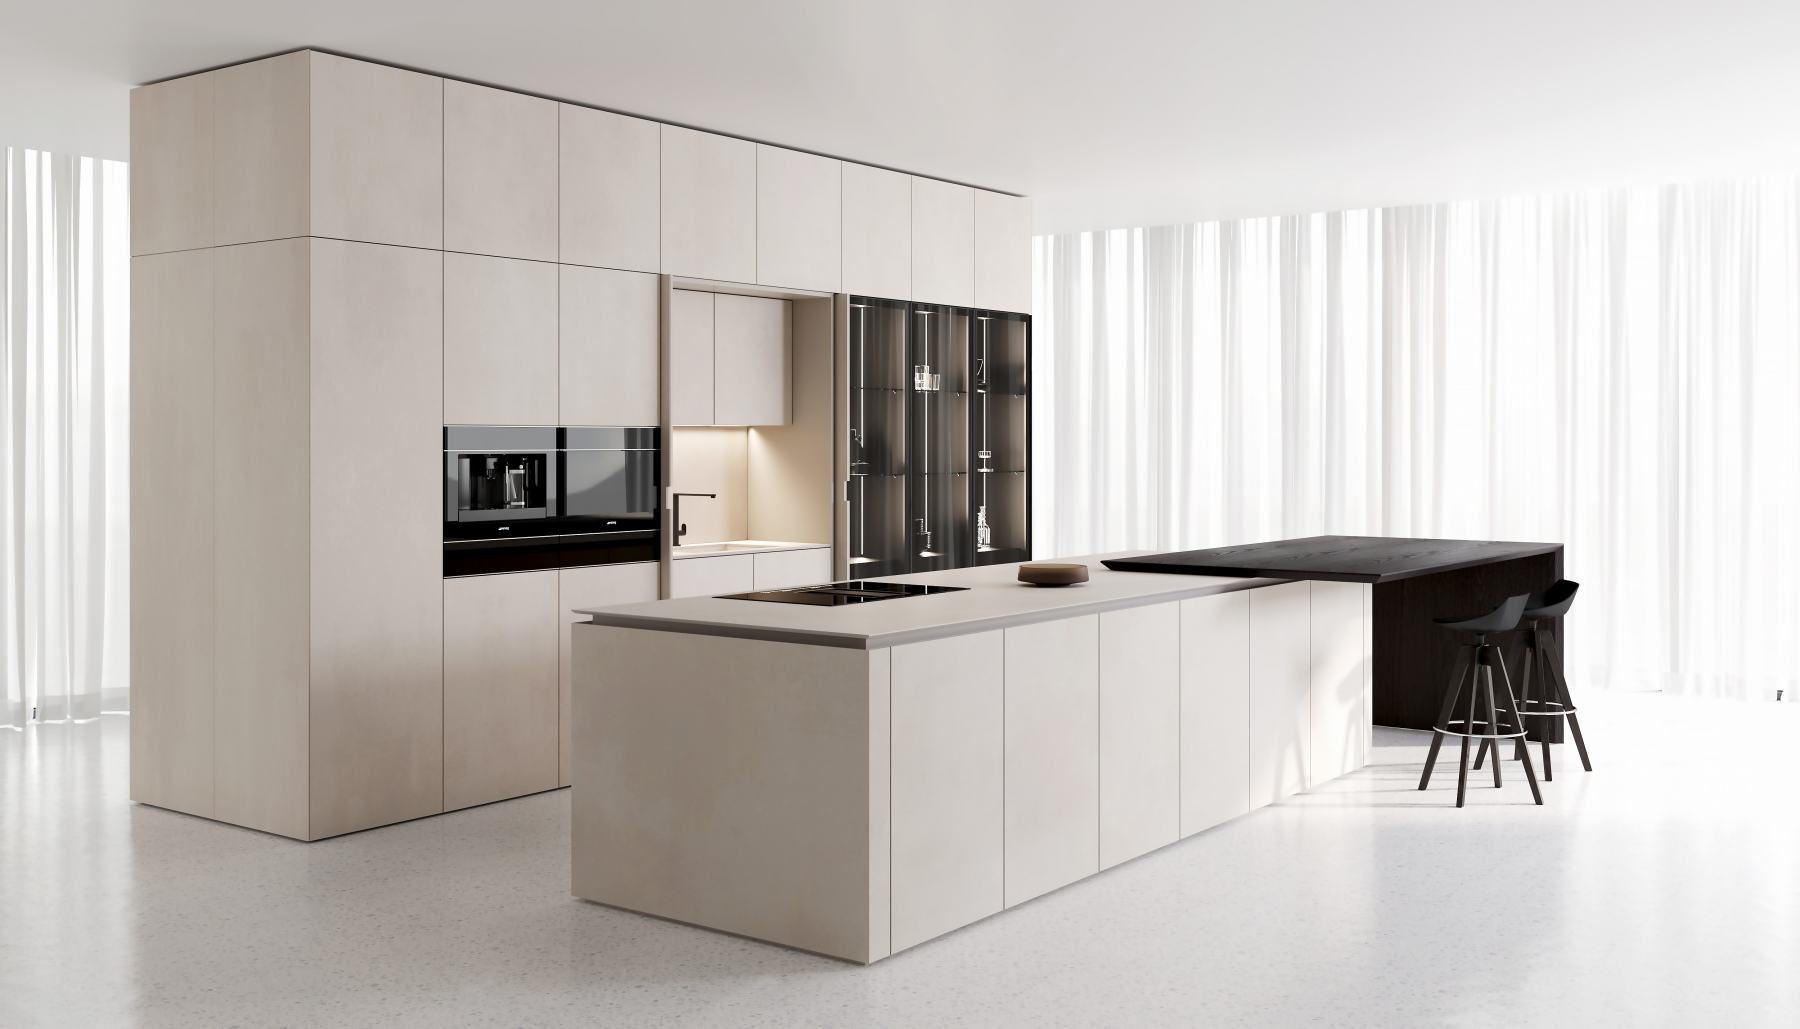 kitchen_studio_calce_4